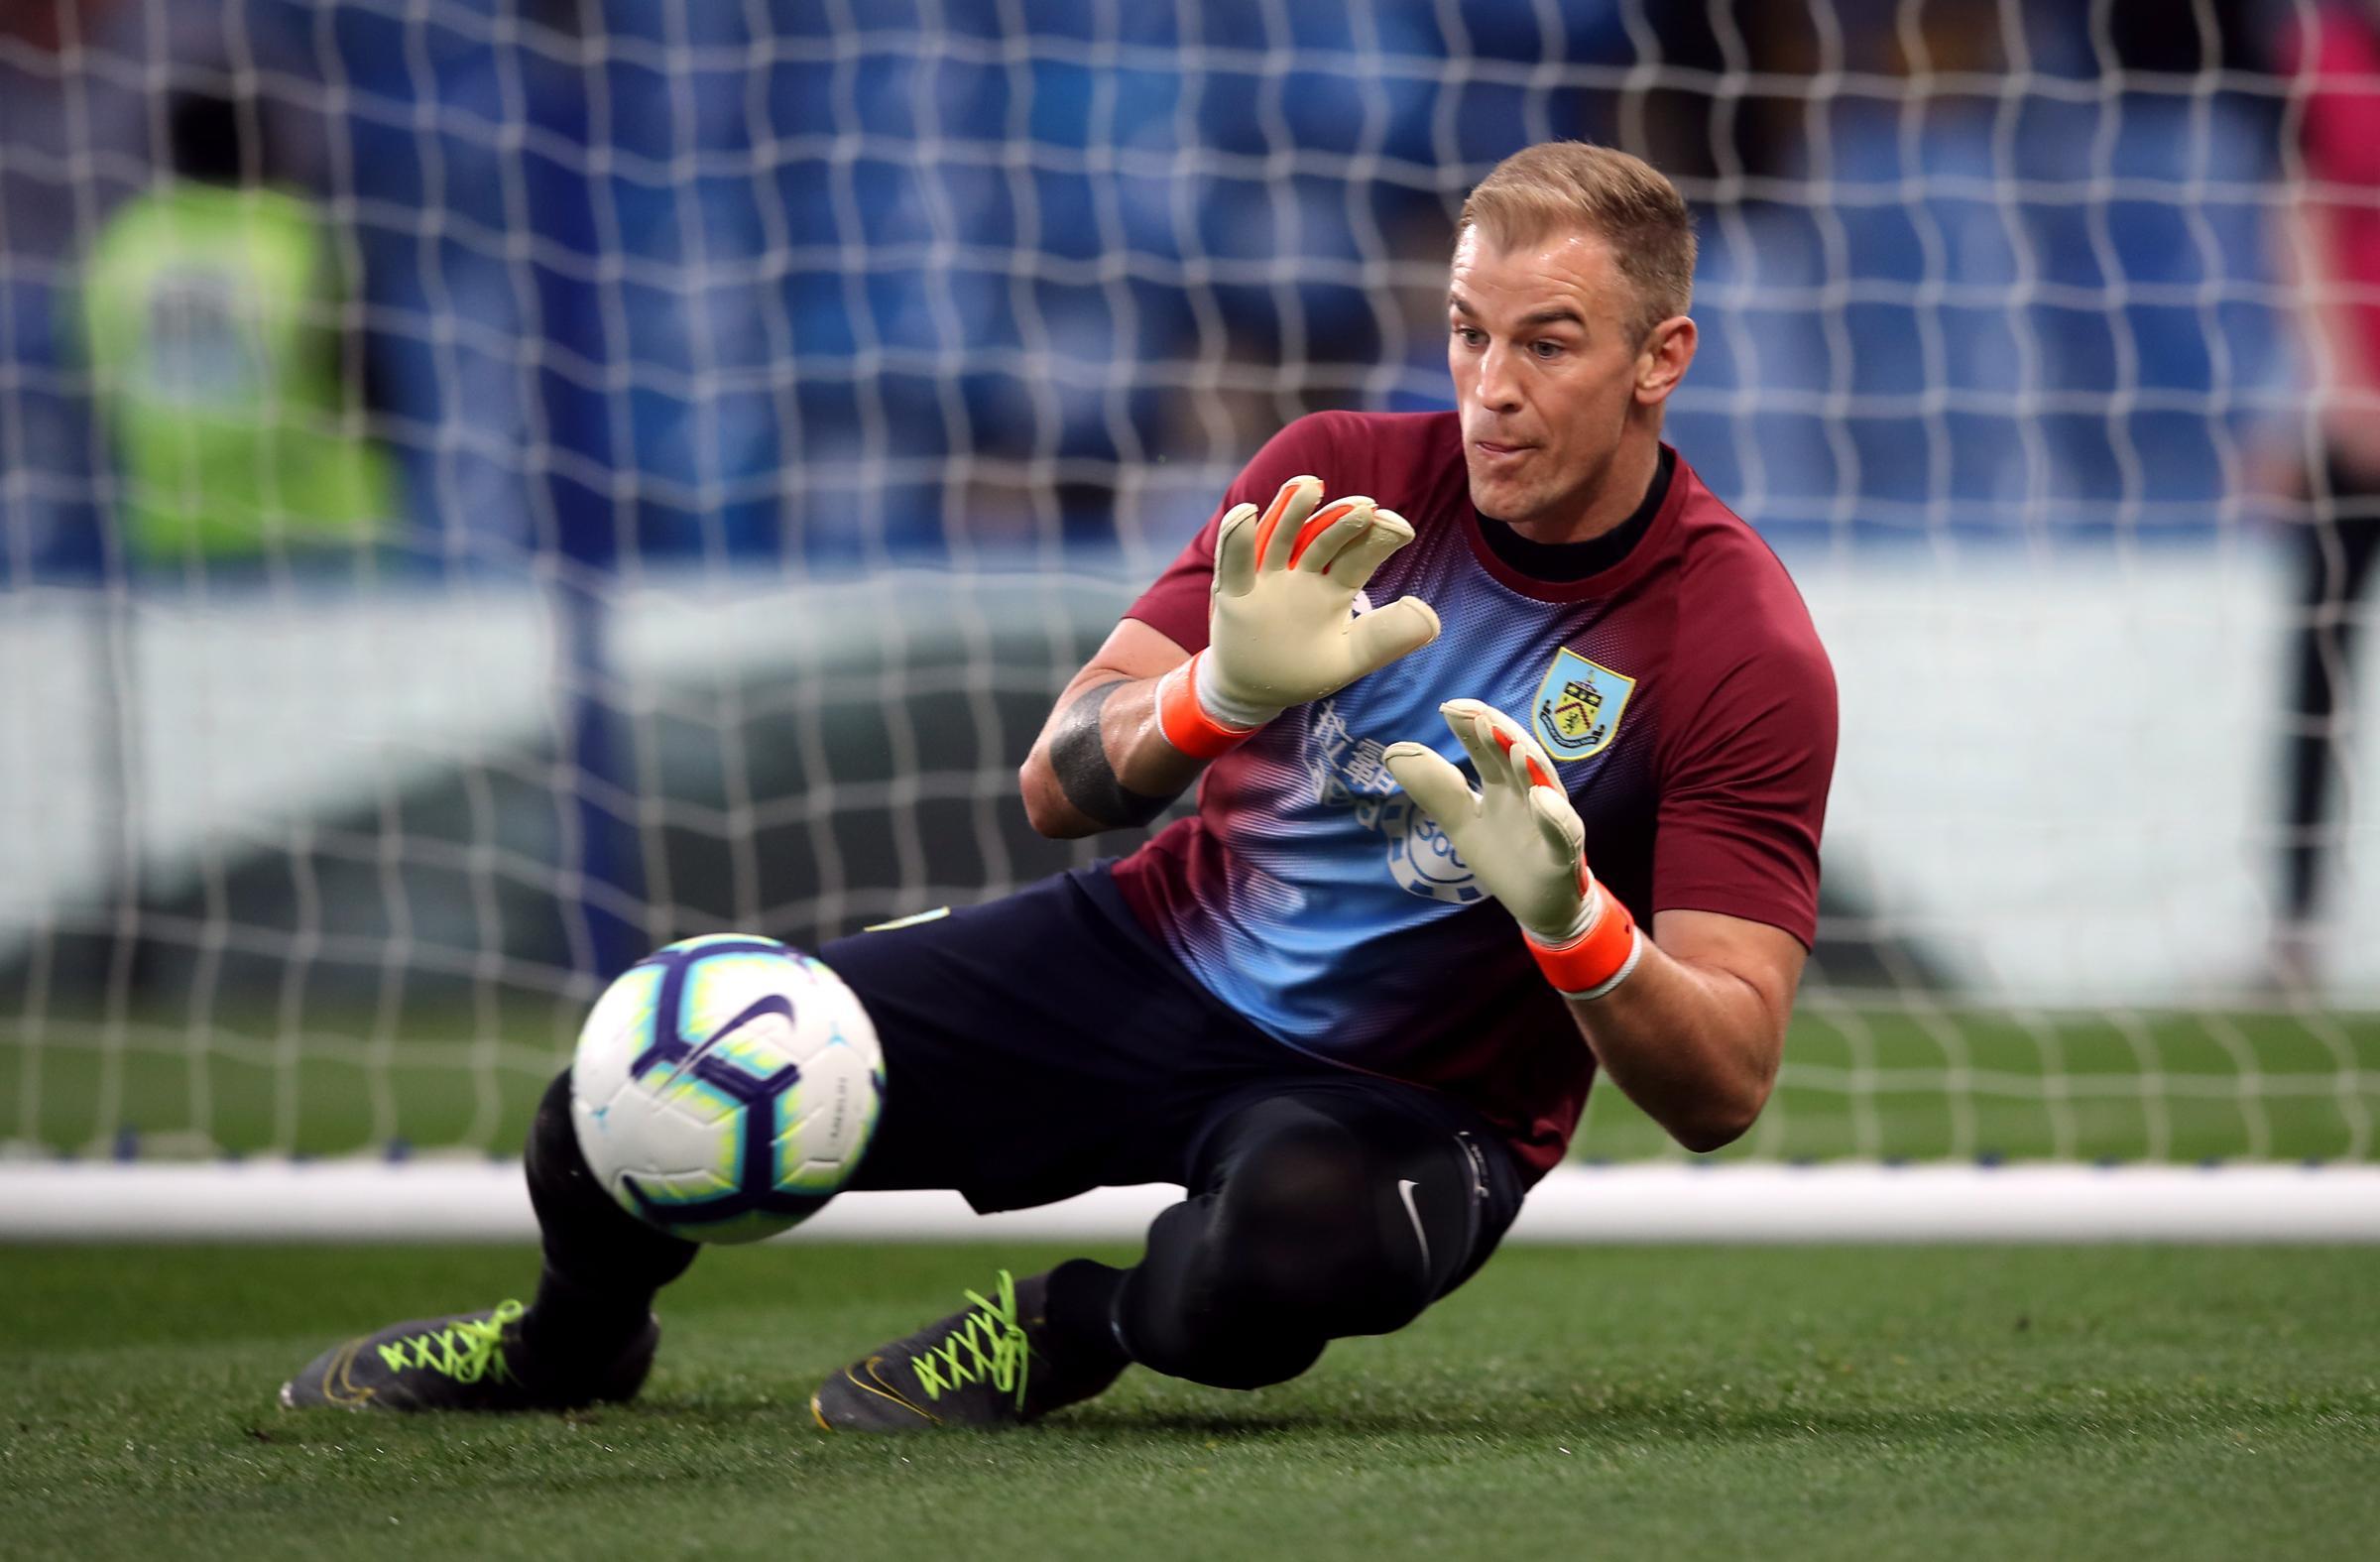 Burnley goalkeeper Joe Hart linked with Lille move